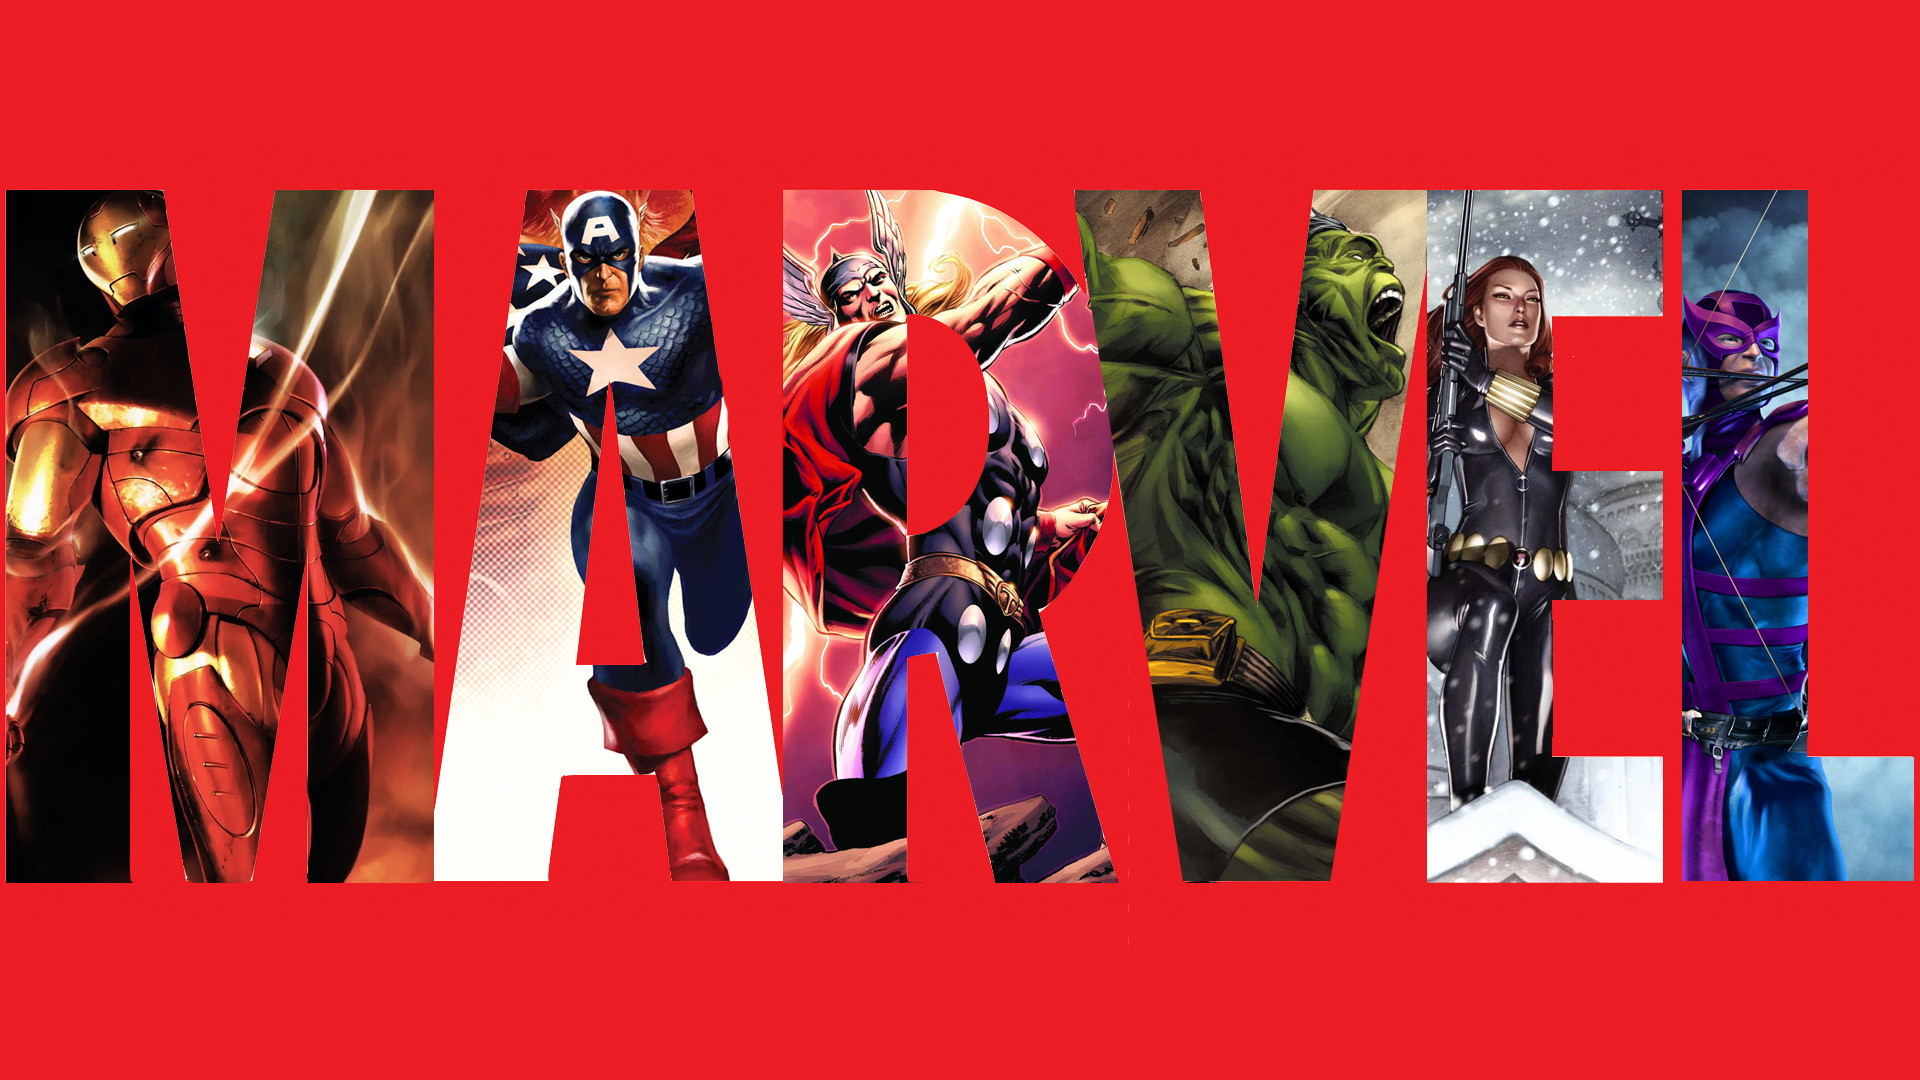 Les pictogrammes des super hros de Marvel et DC Comics 1920x1080